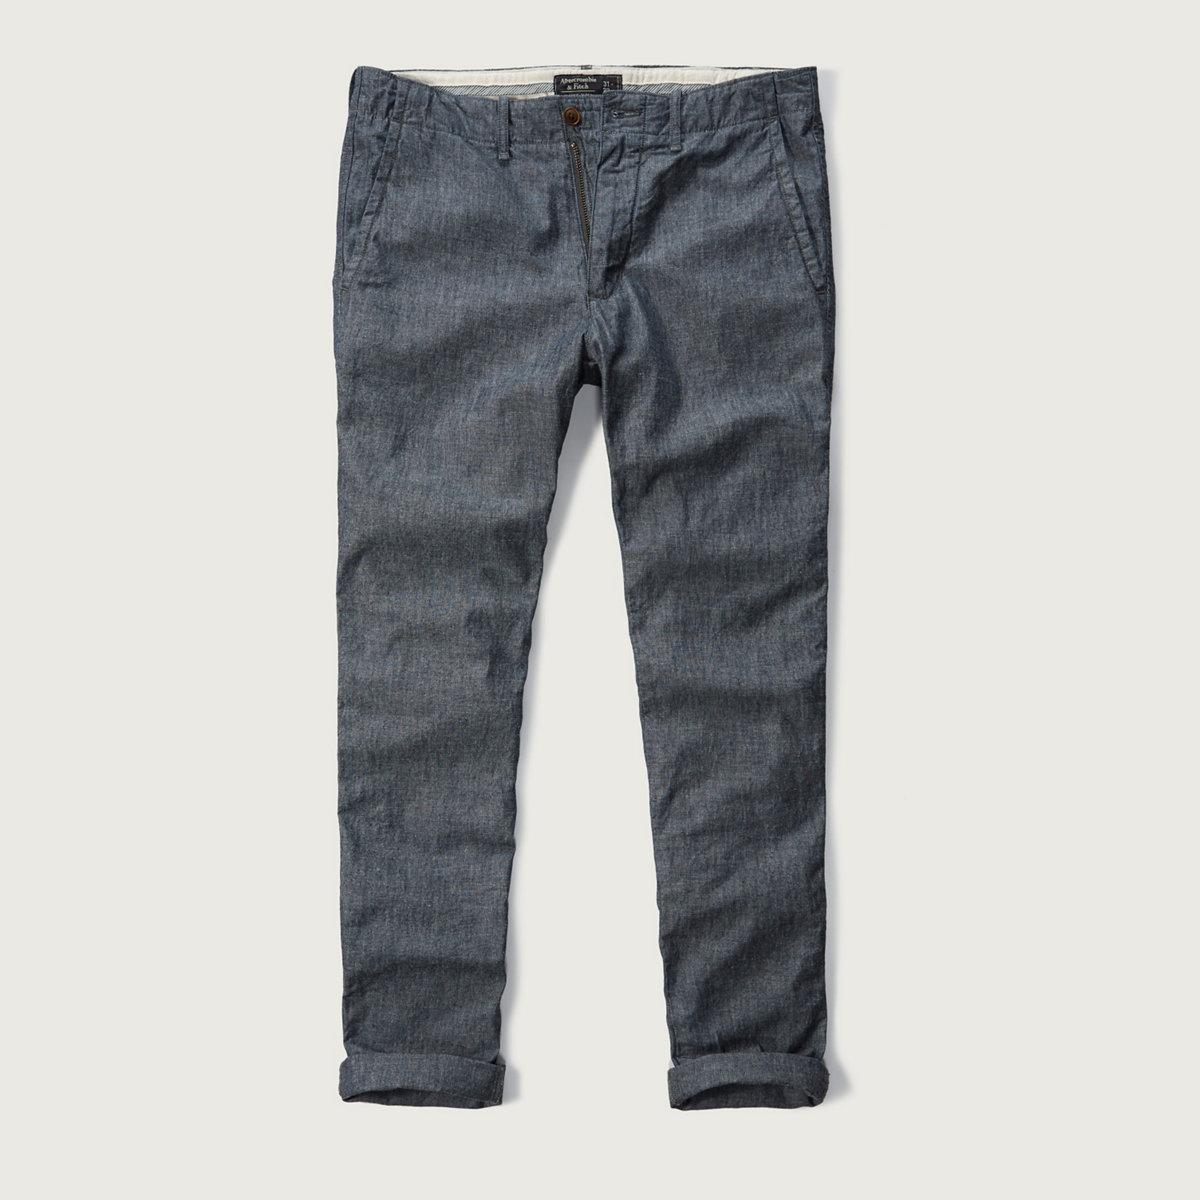 A&F True Indigo Dye Classic Taper Chino Pants